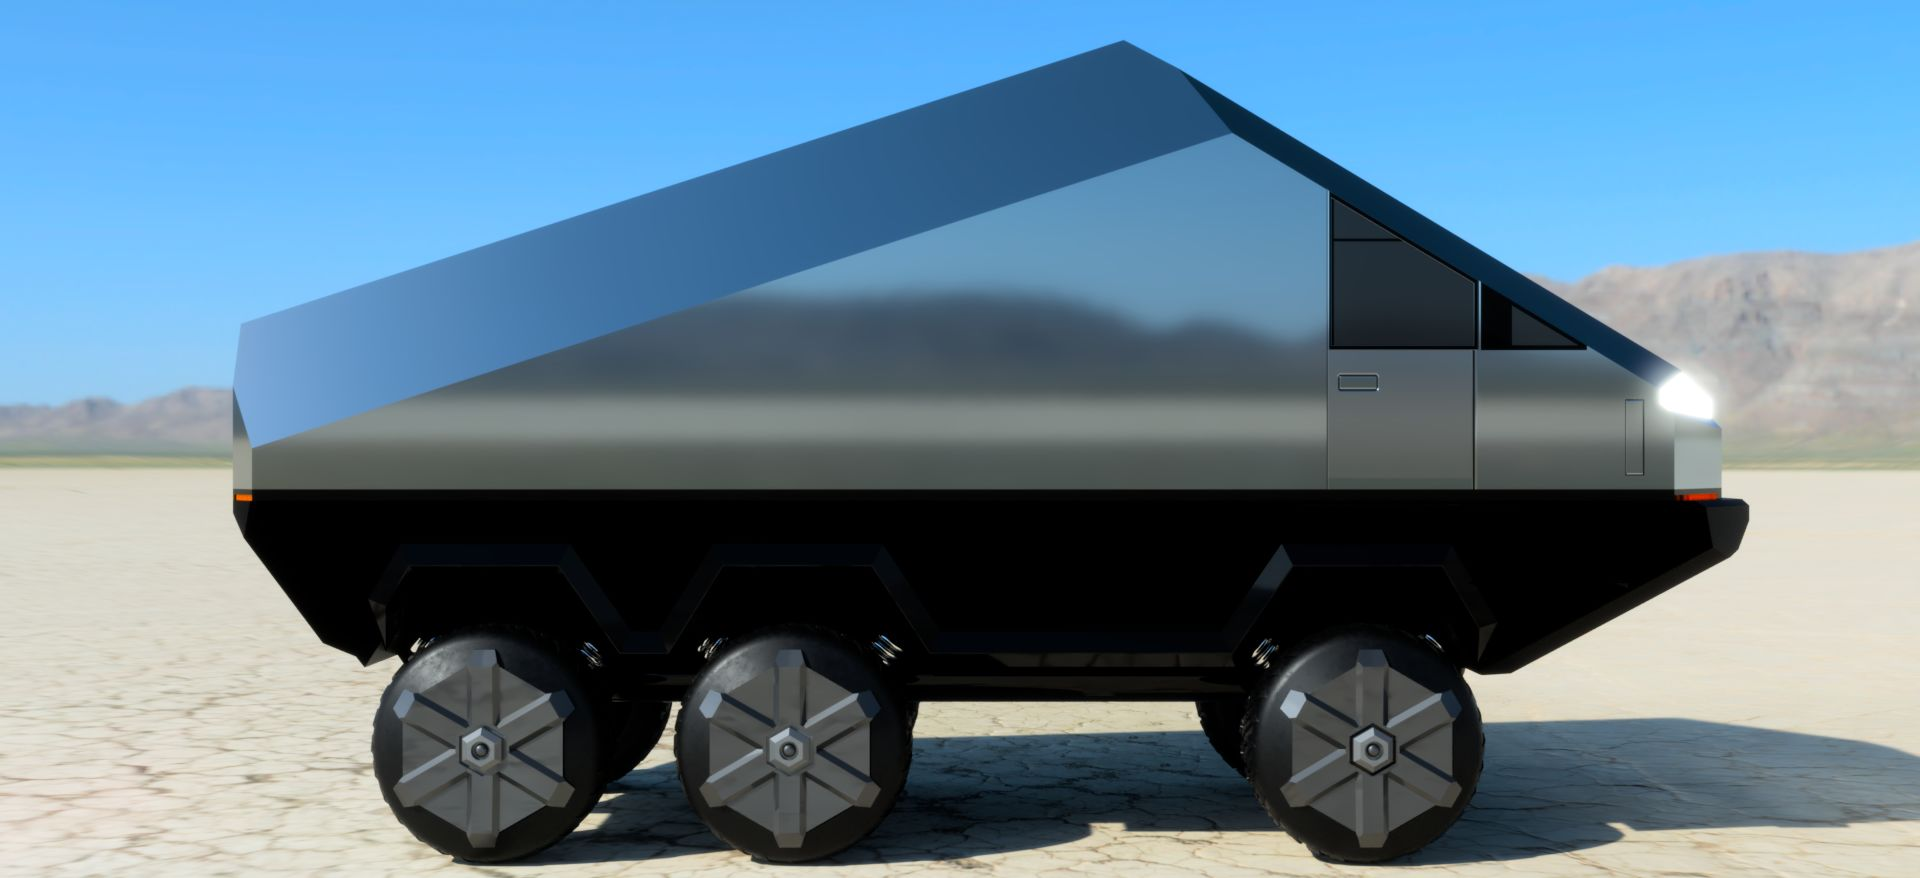 Tesla-semi-cybertruck-2020-apr-14-09-54-08am-000-customizedview36649448585-png-3500-3500